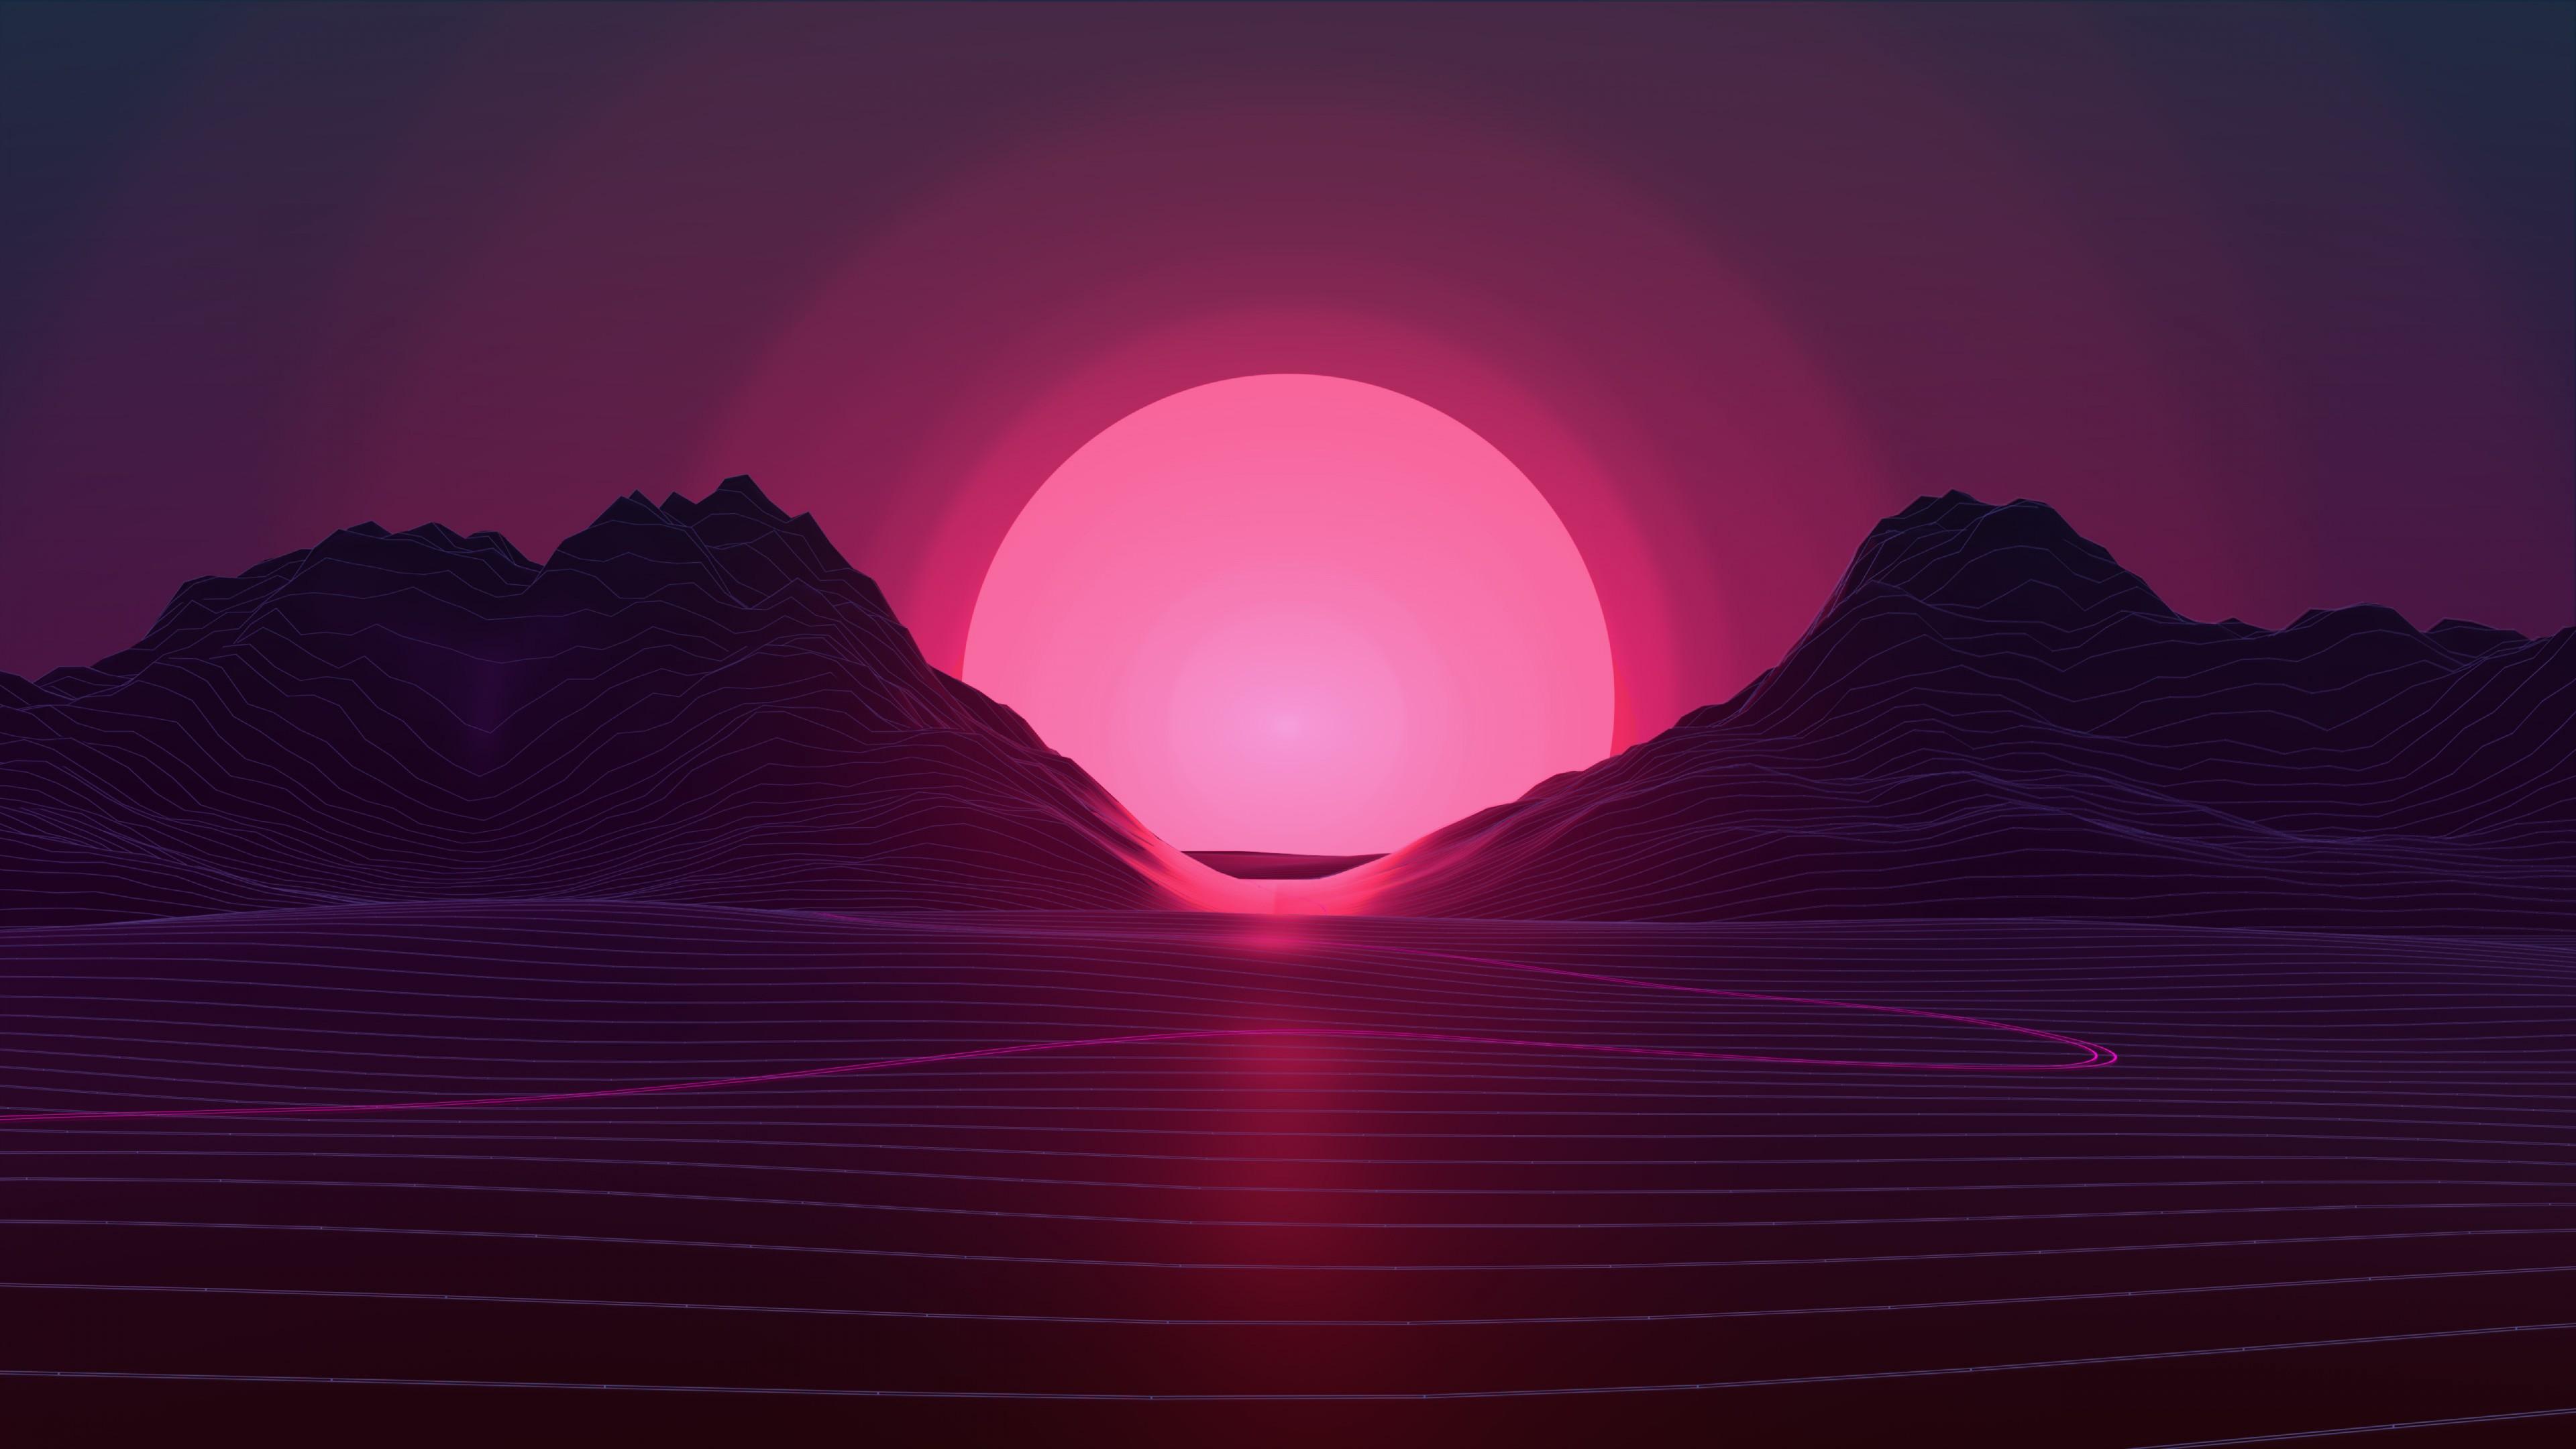 Wallpaper Retrowave, lines, sunset, 4K, Art #18950 - Page 716